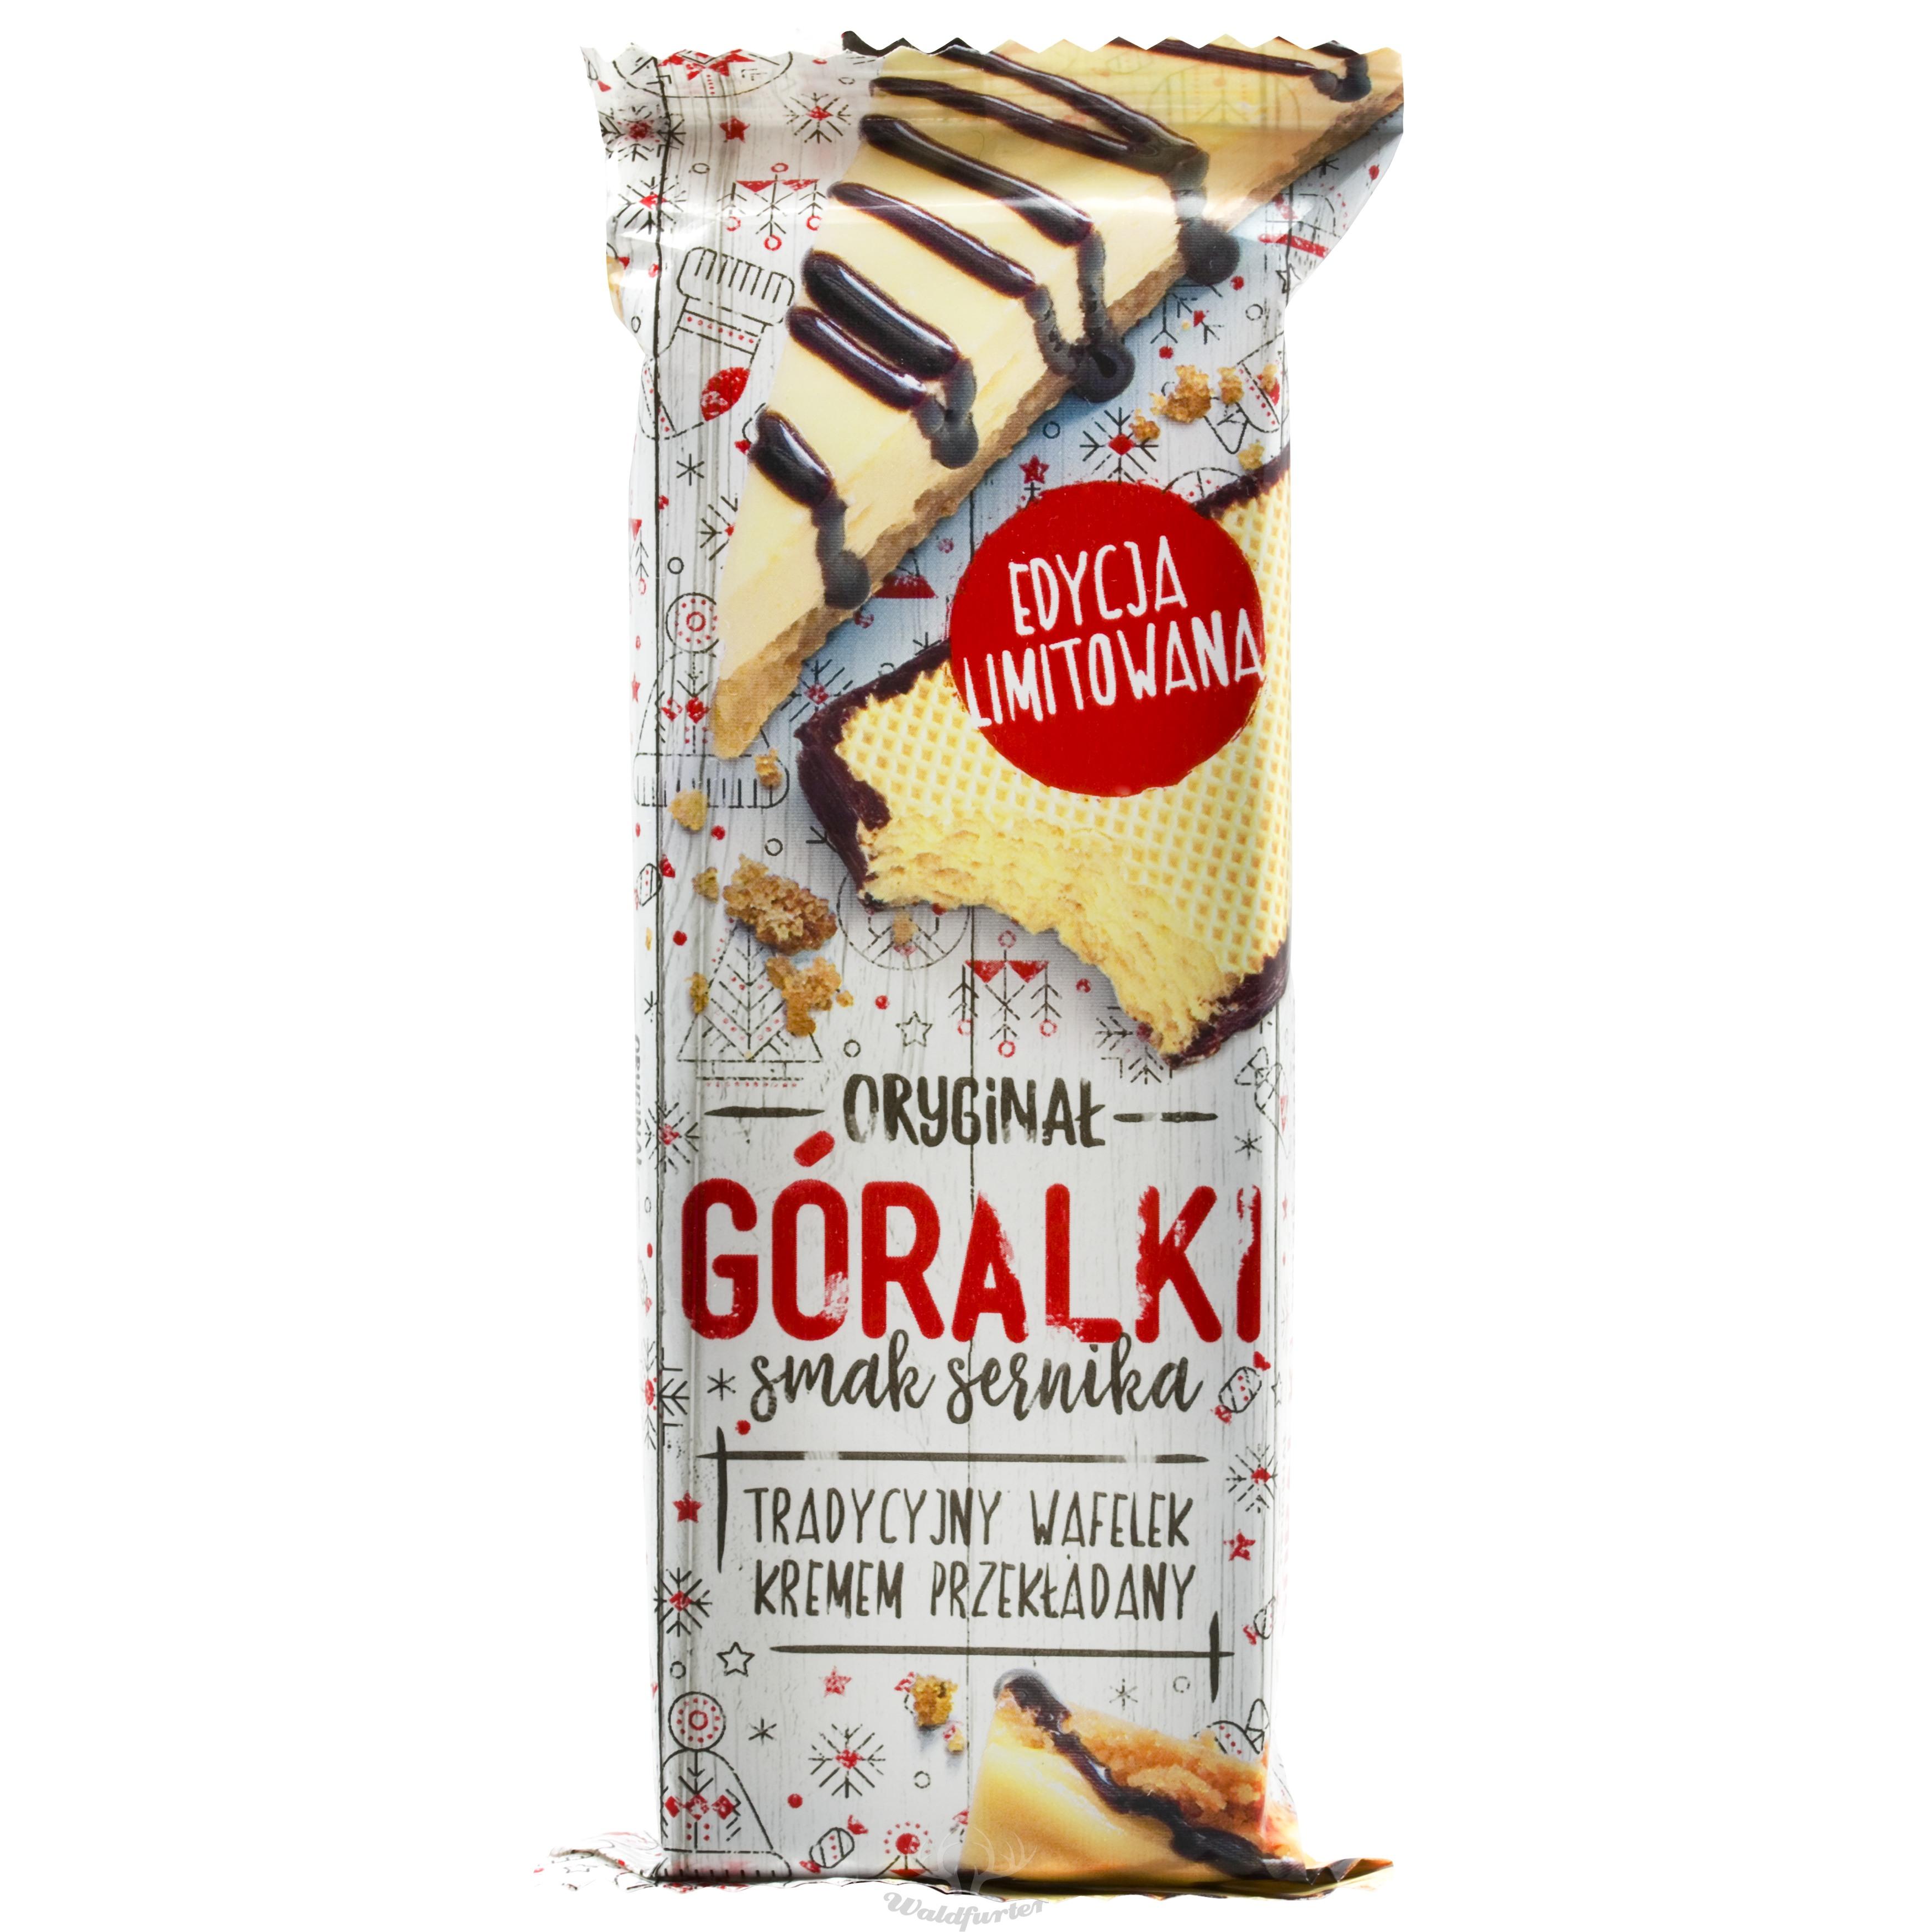 Goralki Waffel  mit Käsekuchengeschmack 50g   //  Goralki Wafelek  o smaku sernika 50g